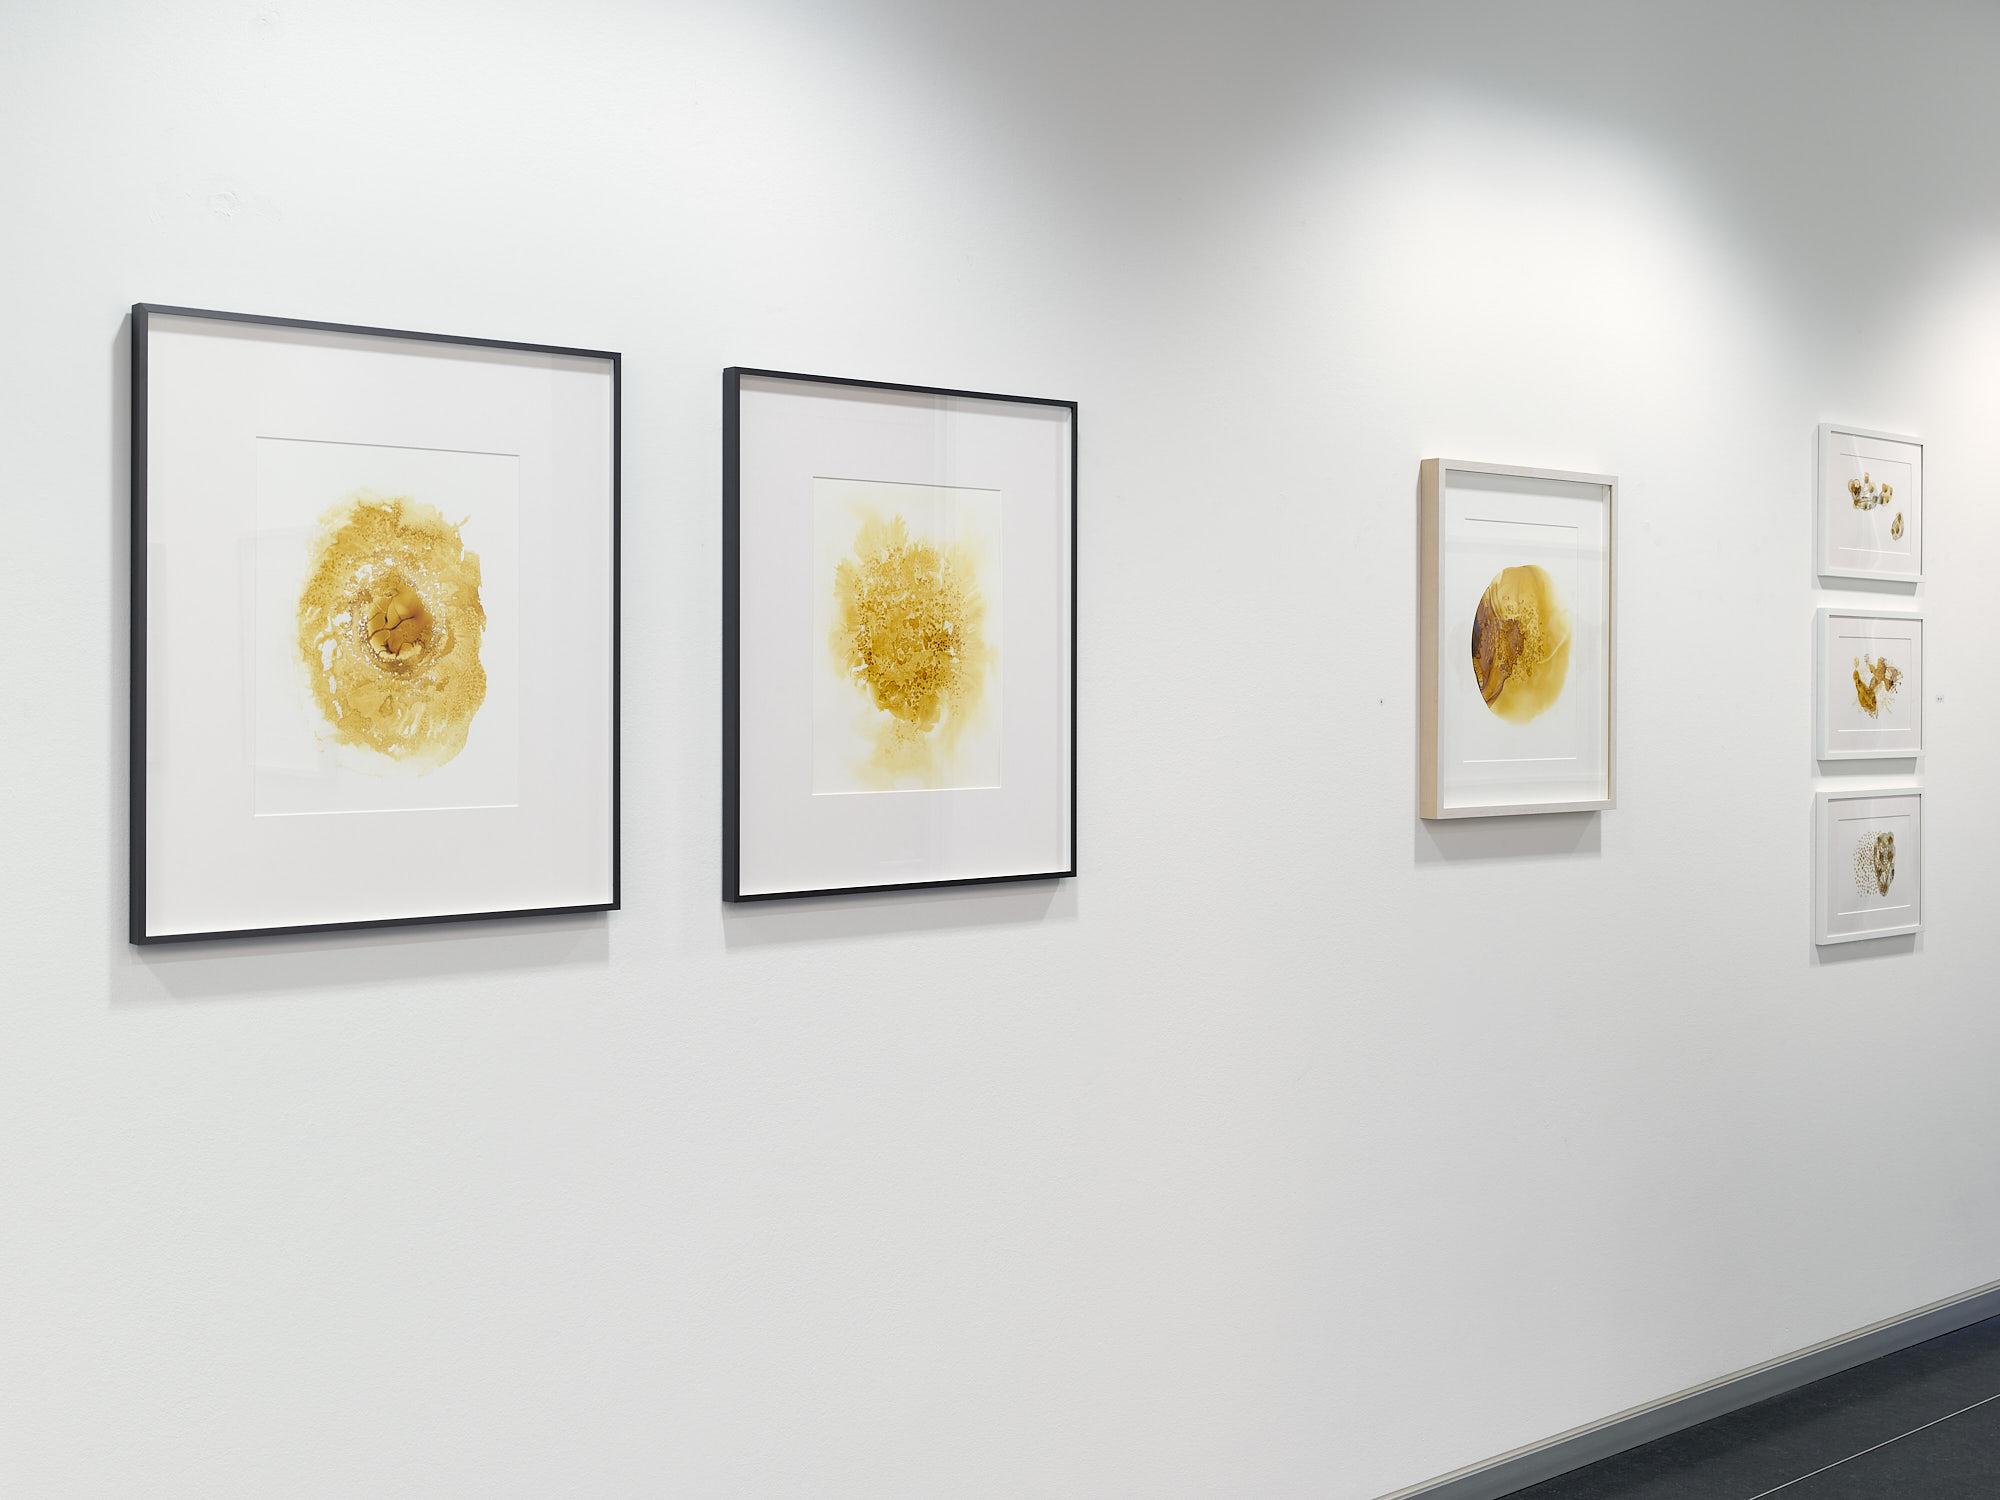 Michelle Concepción, Ambers, exhibition view